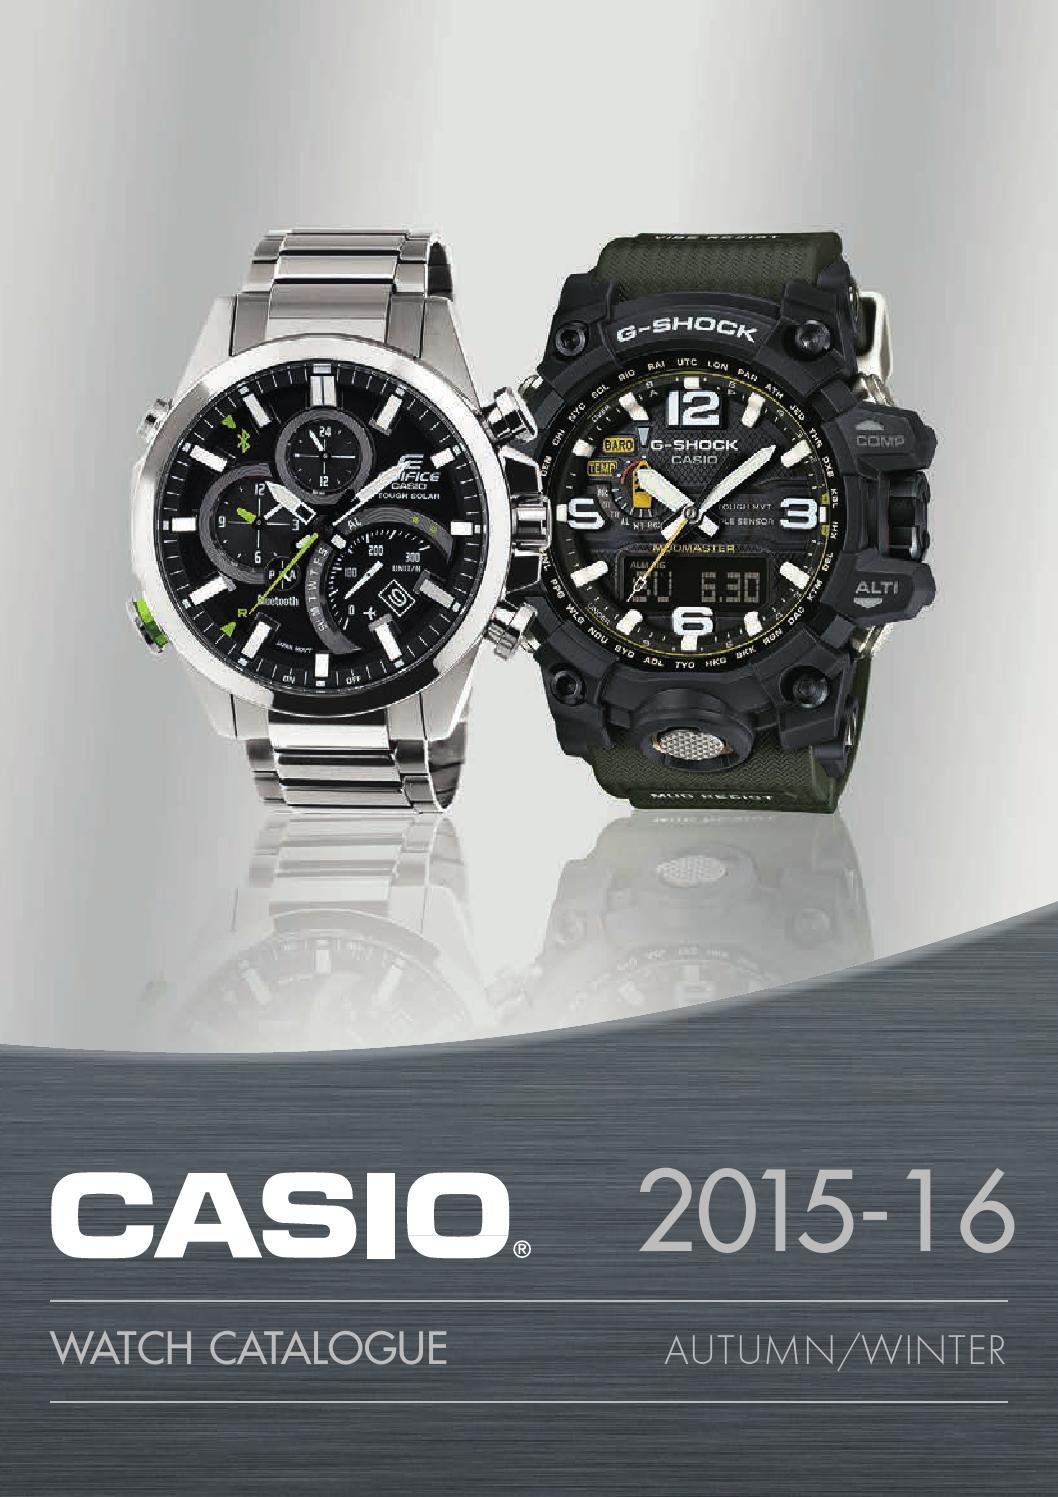 Casio Klokkekatalog 2015 2016 Norge By Scandinavia Issuu G Shock Gd X6900ht 2 Resin Band Watch Blue